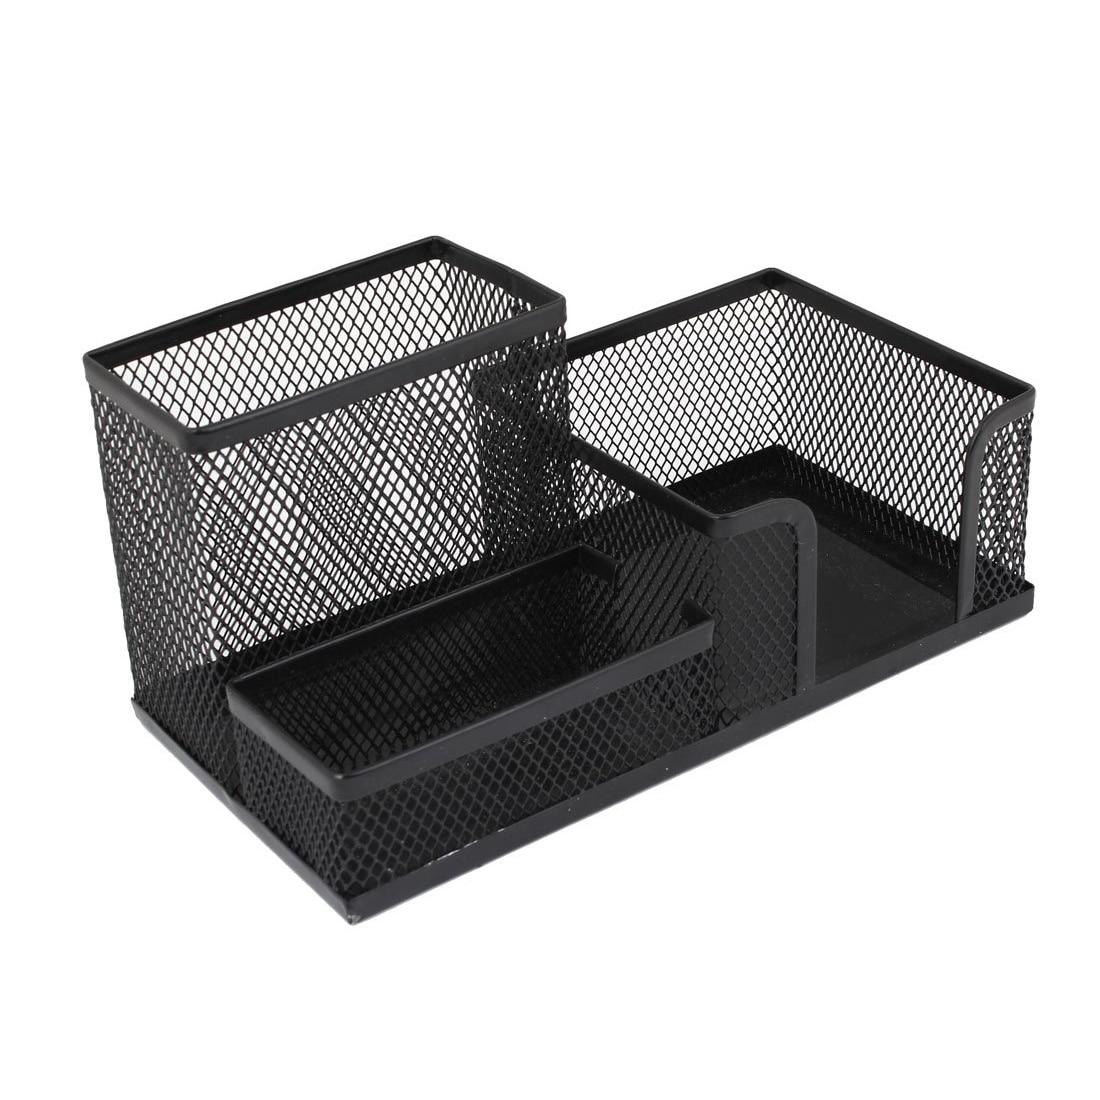 Black Cube Metal Stand Mesh Style Pen Pencil Ruler Holder Desk Organizer Storage